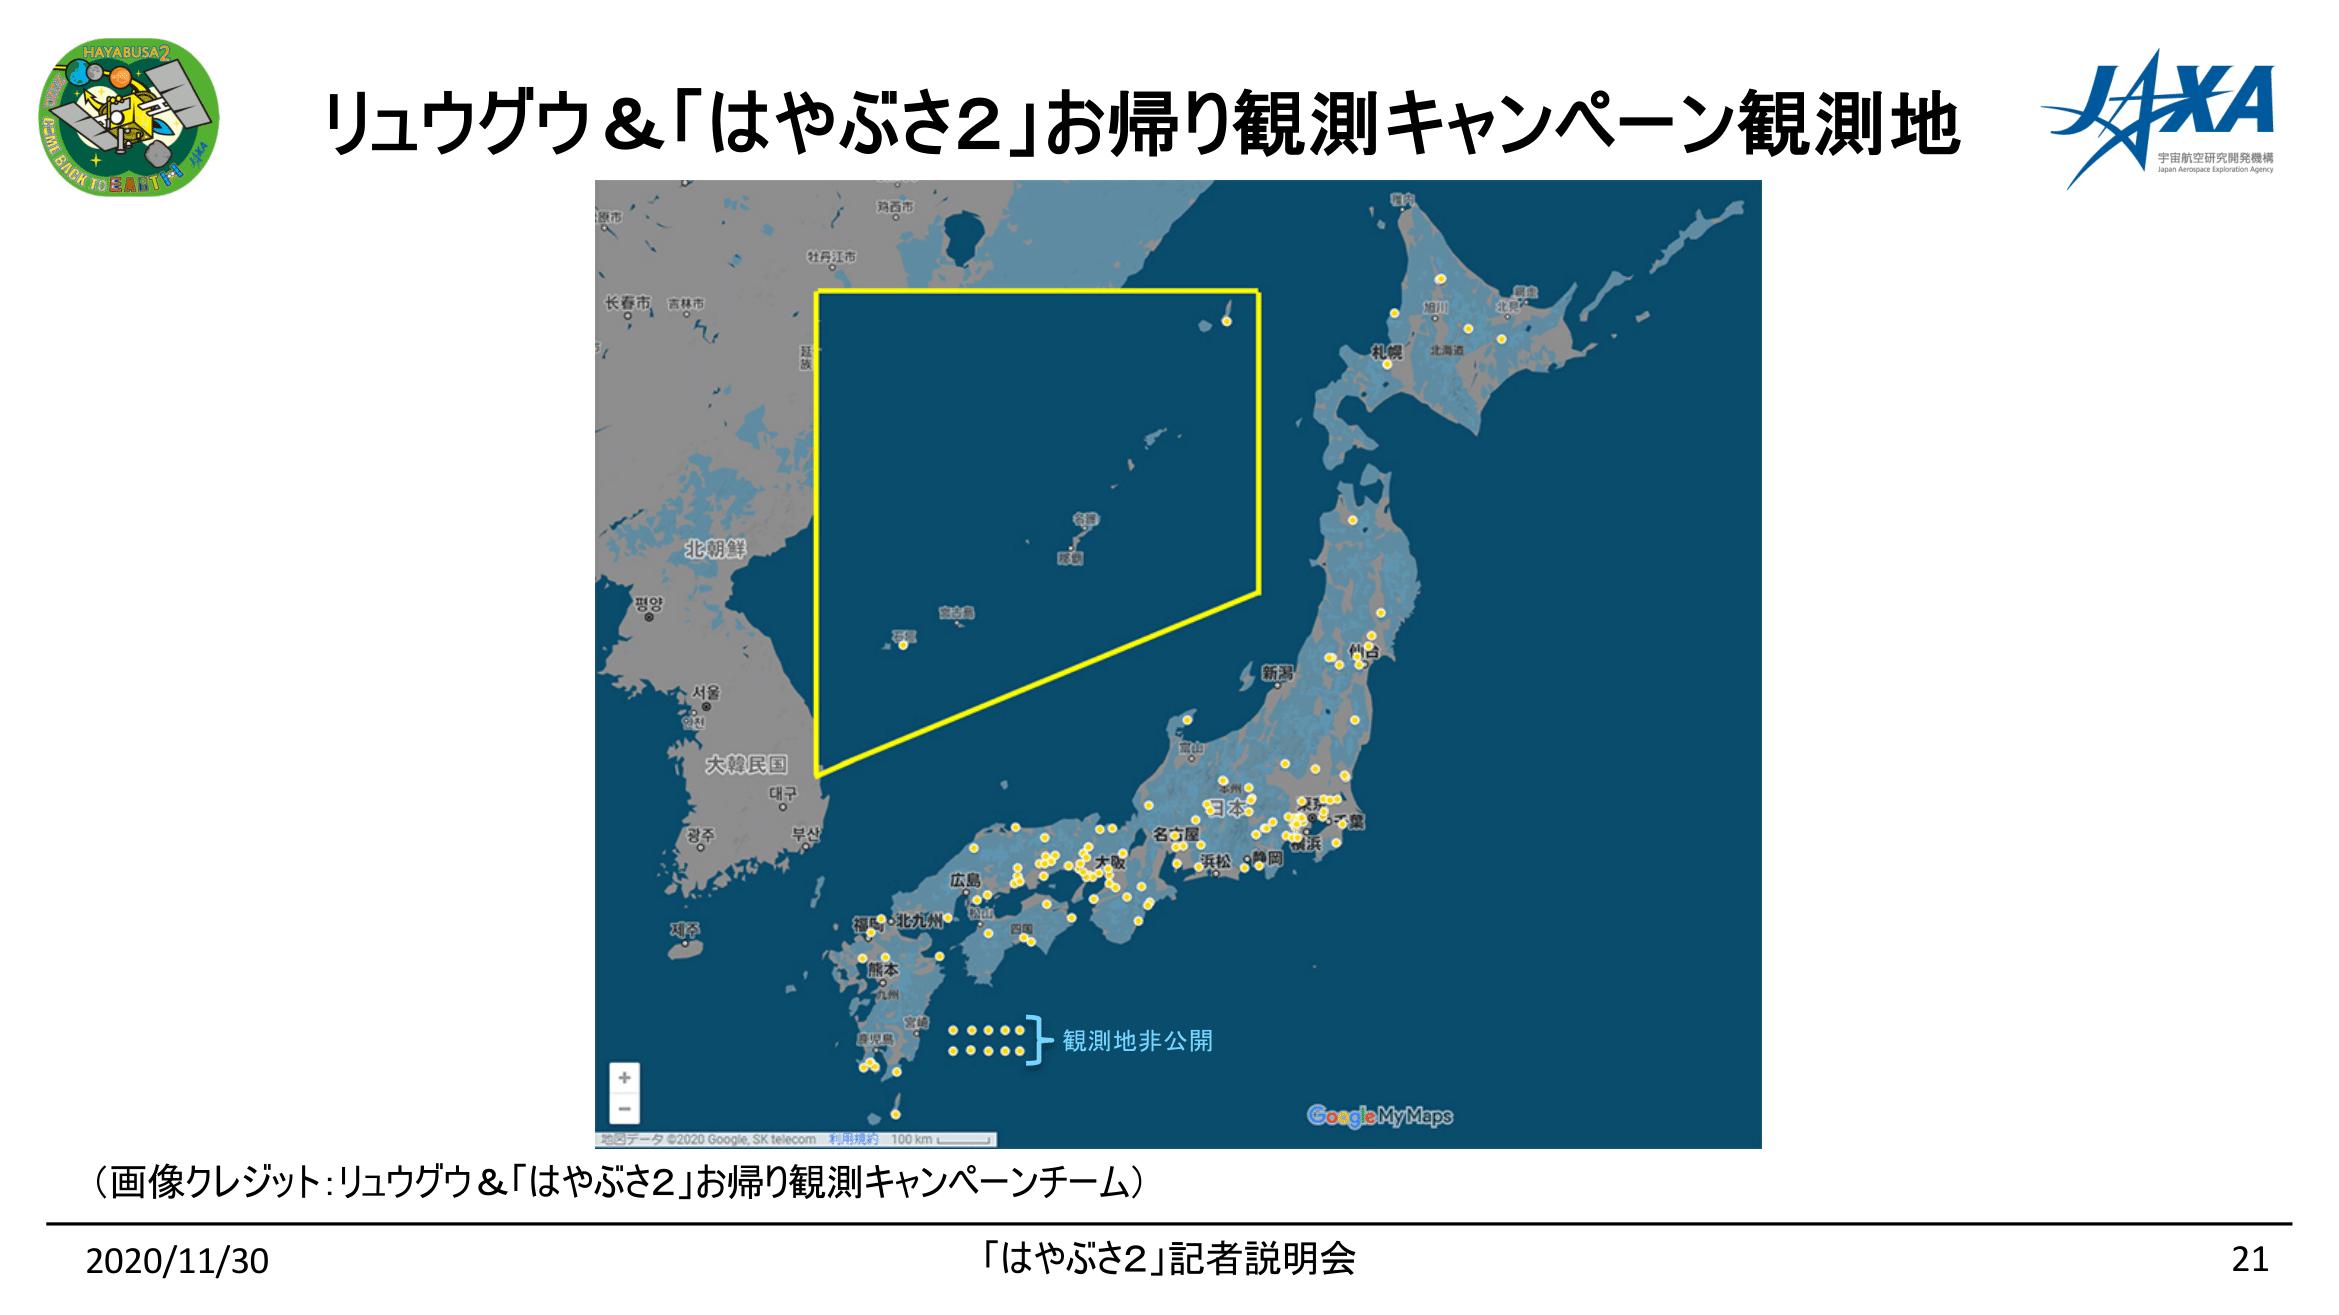 f:id:Imamura:20201130154247p:plain